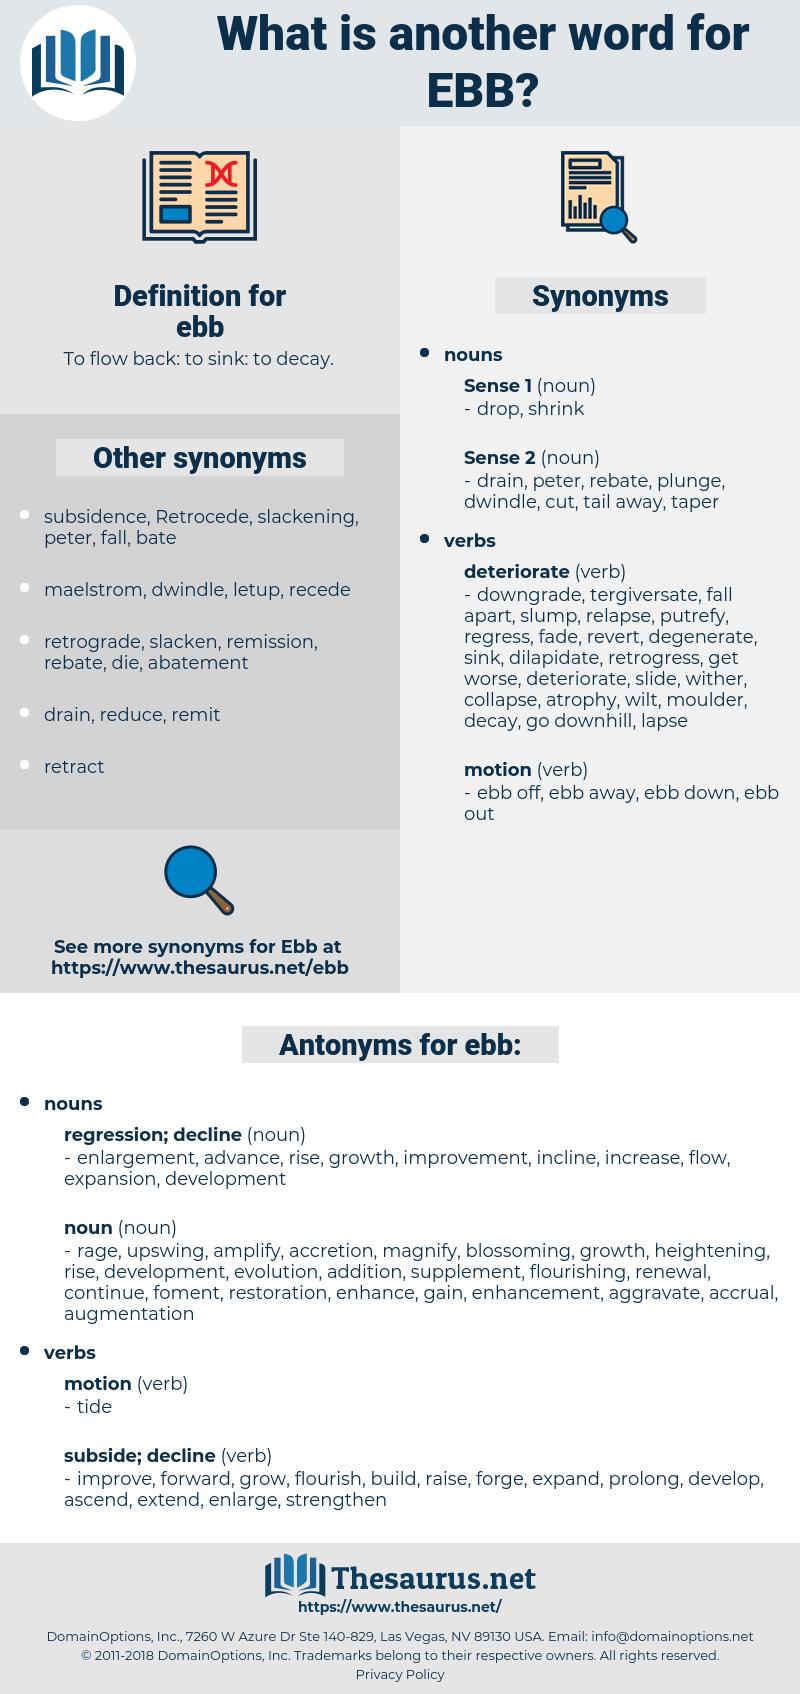 ebb, synonym ebb, another word for ebb, words like ebb, thesaurus ebb